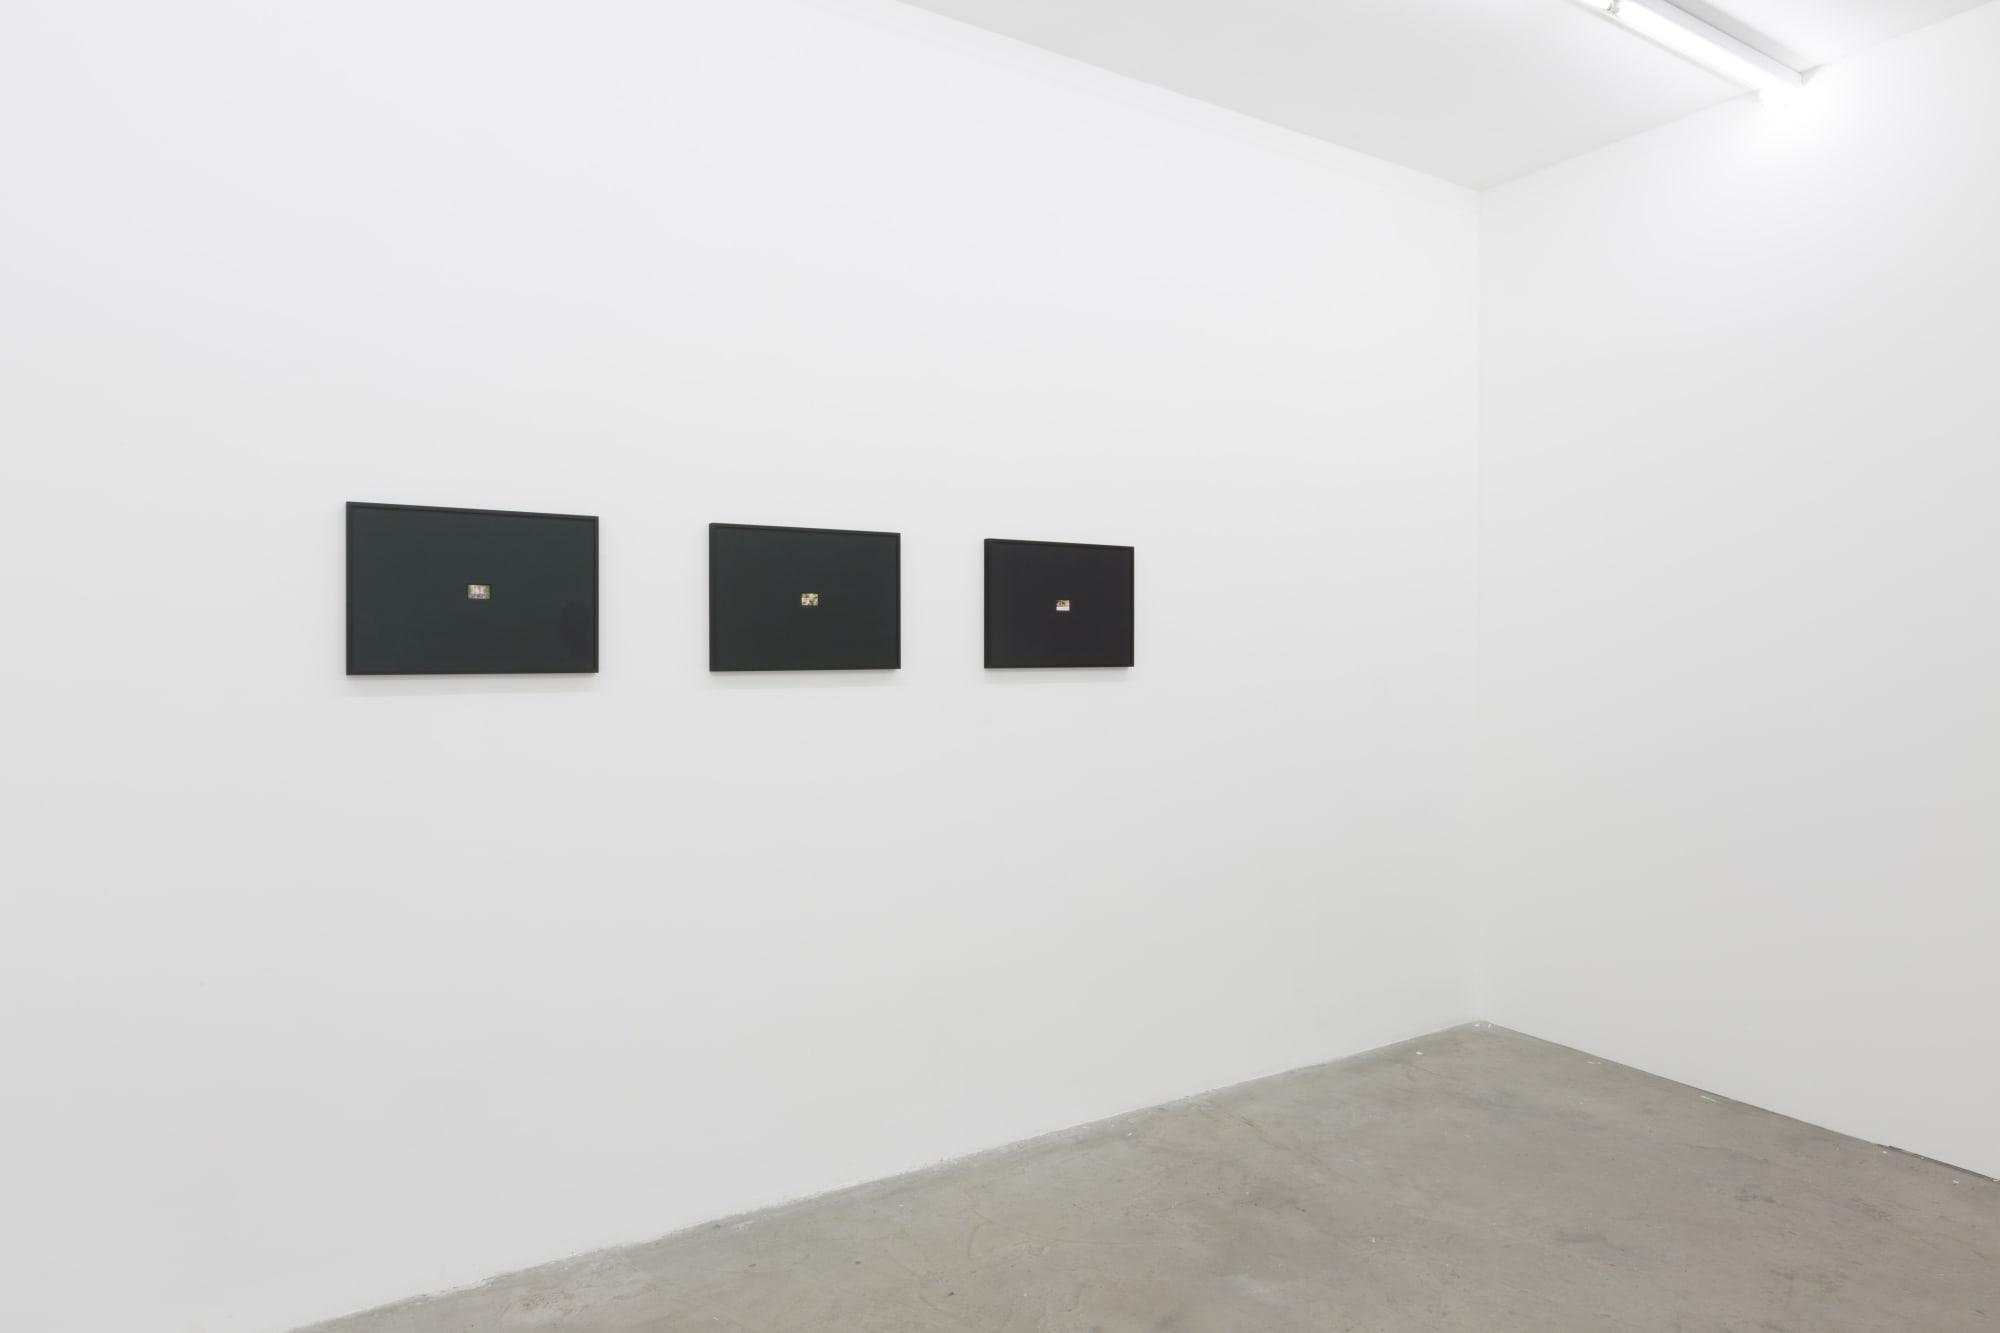 Marcin Dudek, Too Close For Comfort, installation view, Edel Assanti, 2017